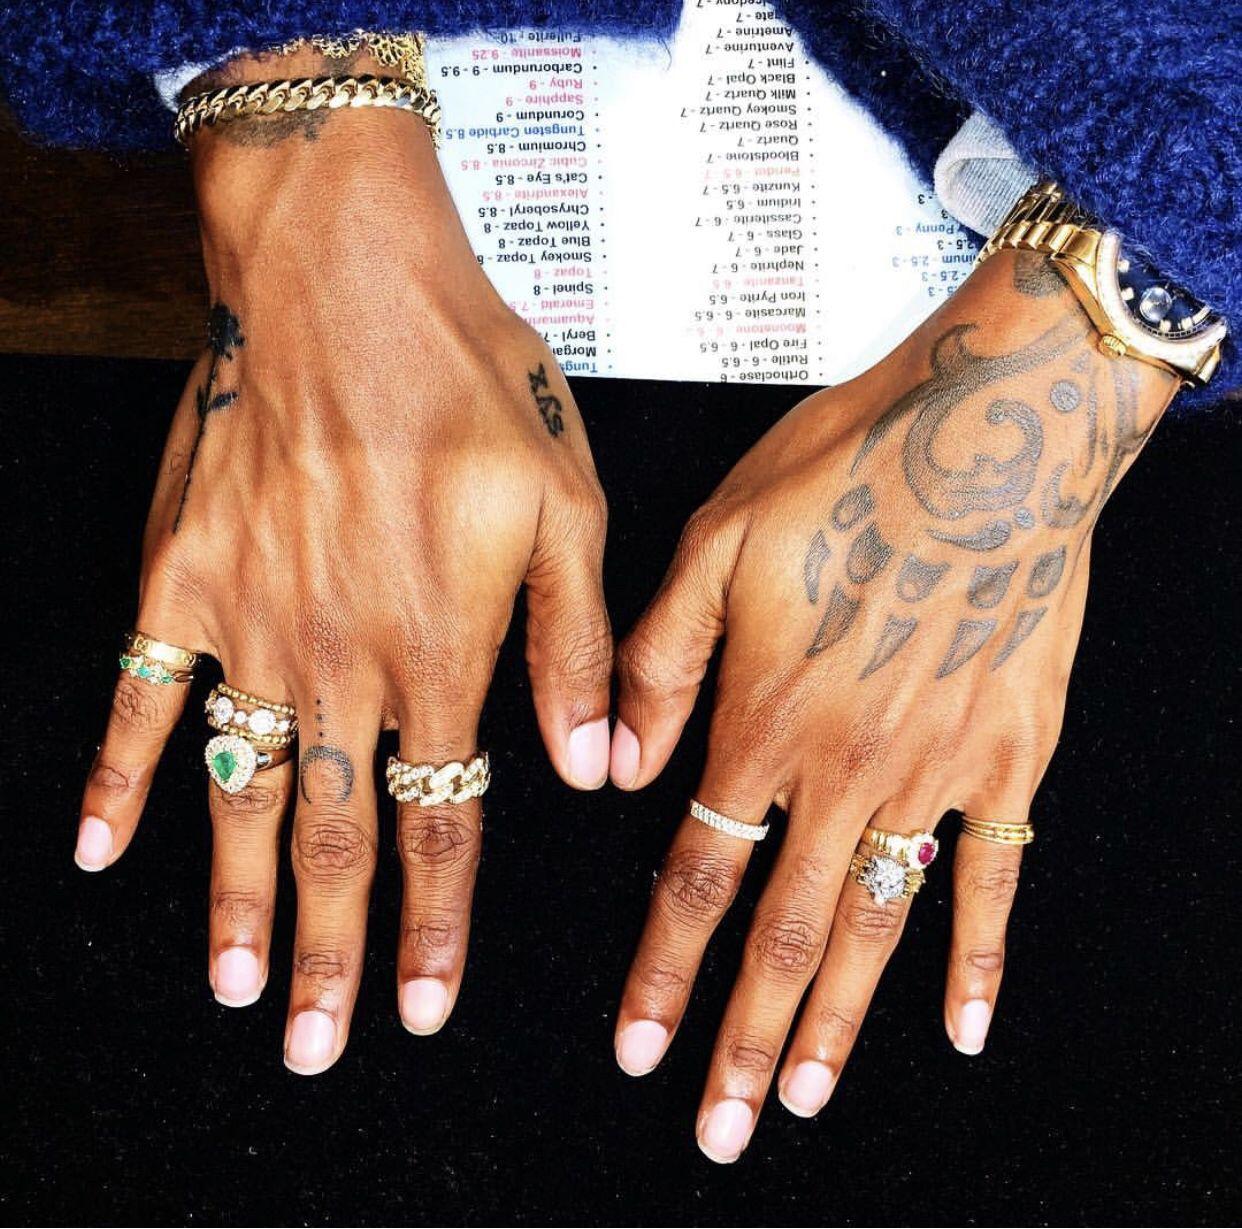 6lack Hands Henna Hand Tattoo Tattoo Designs Tattoos And Piercings